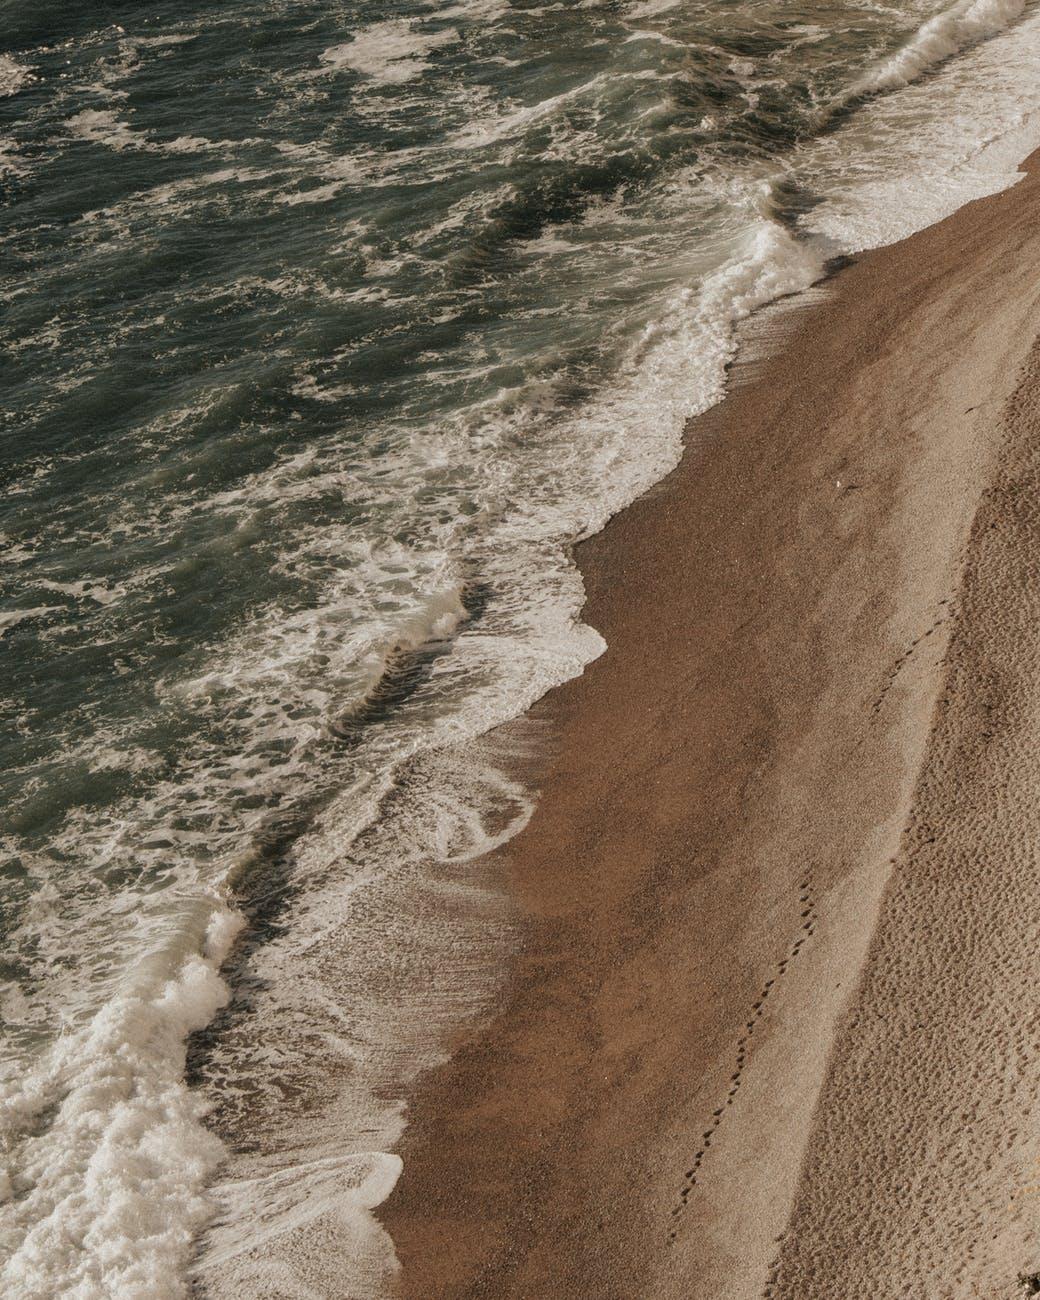 foamy sea washing sandy beach